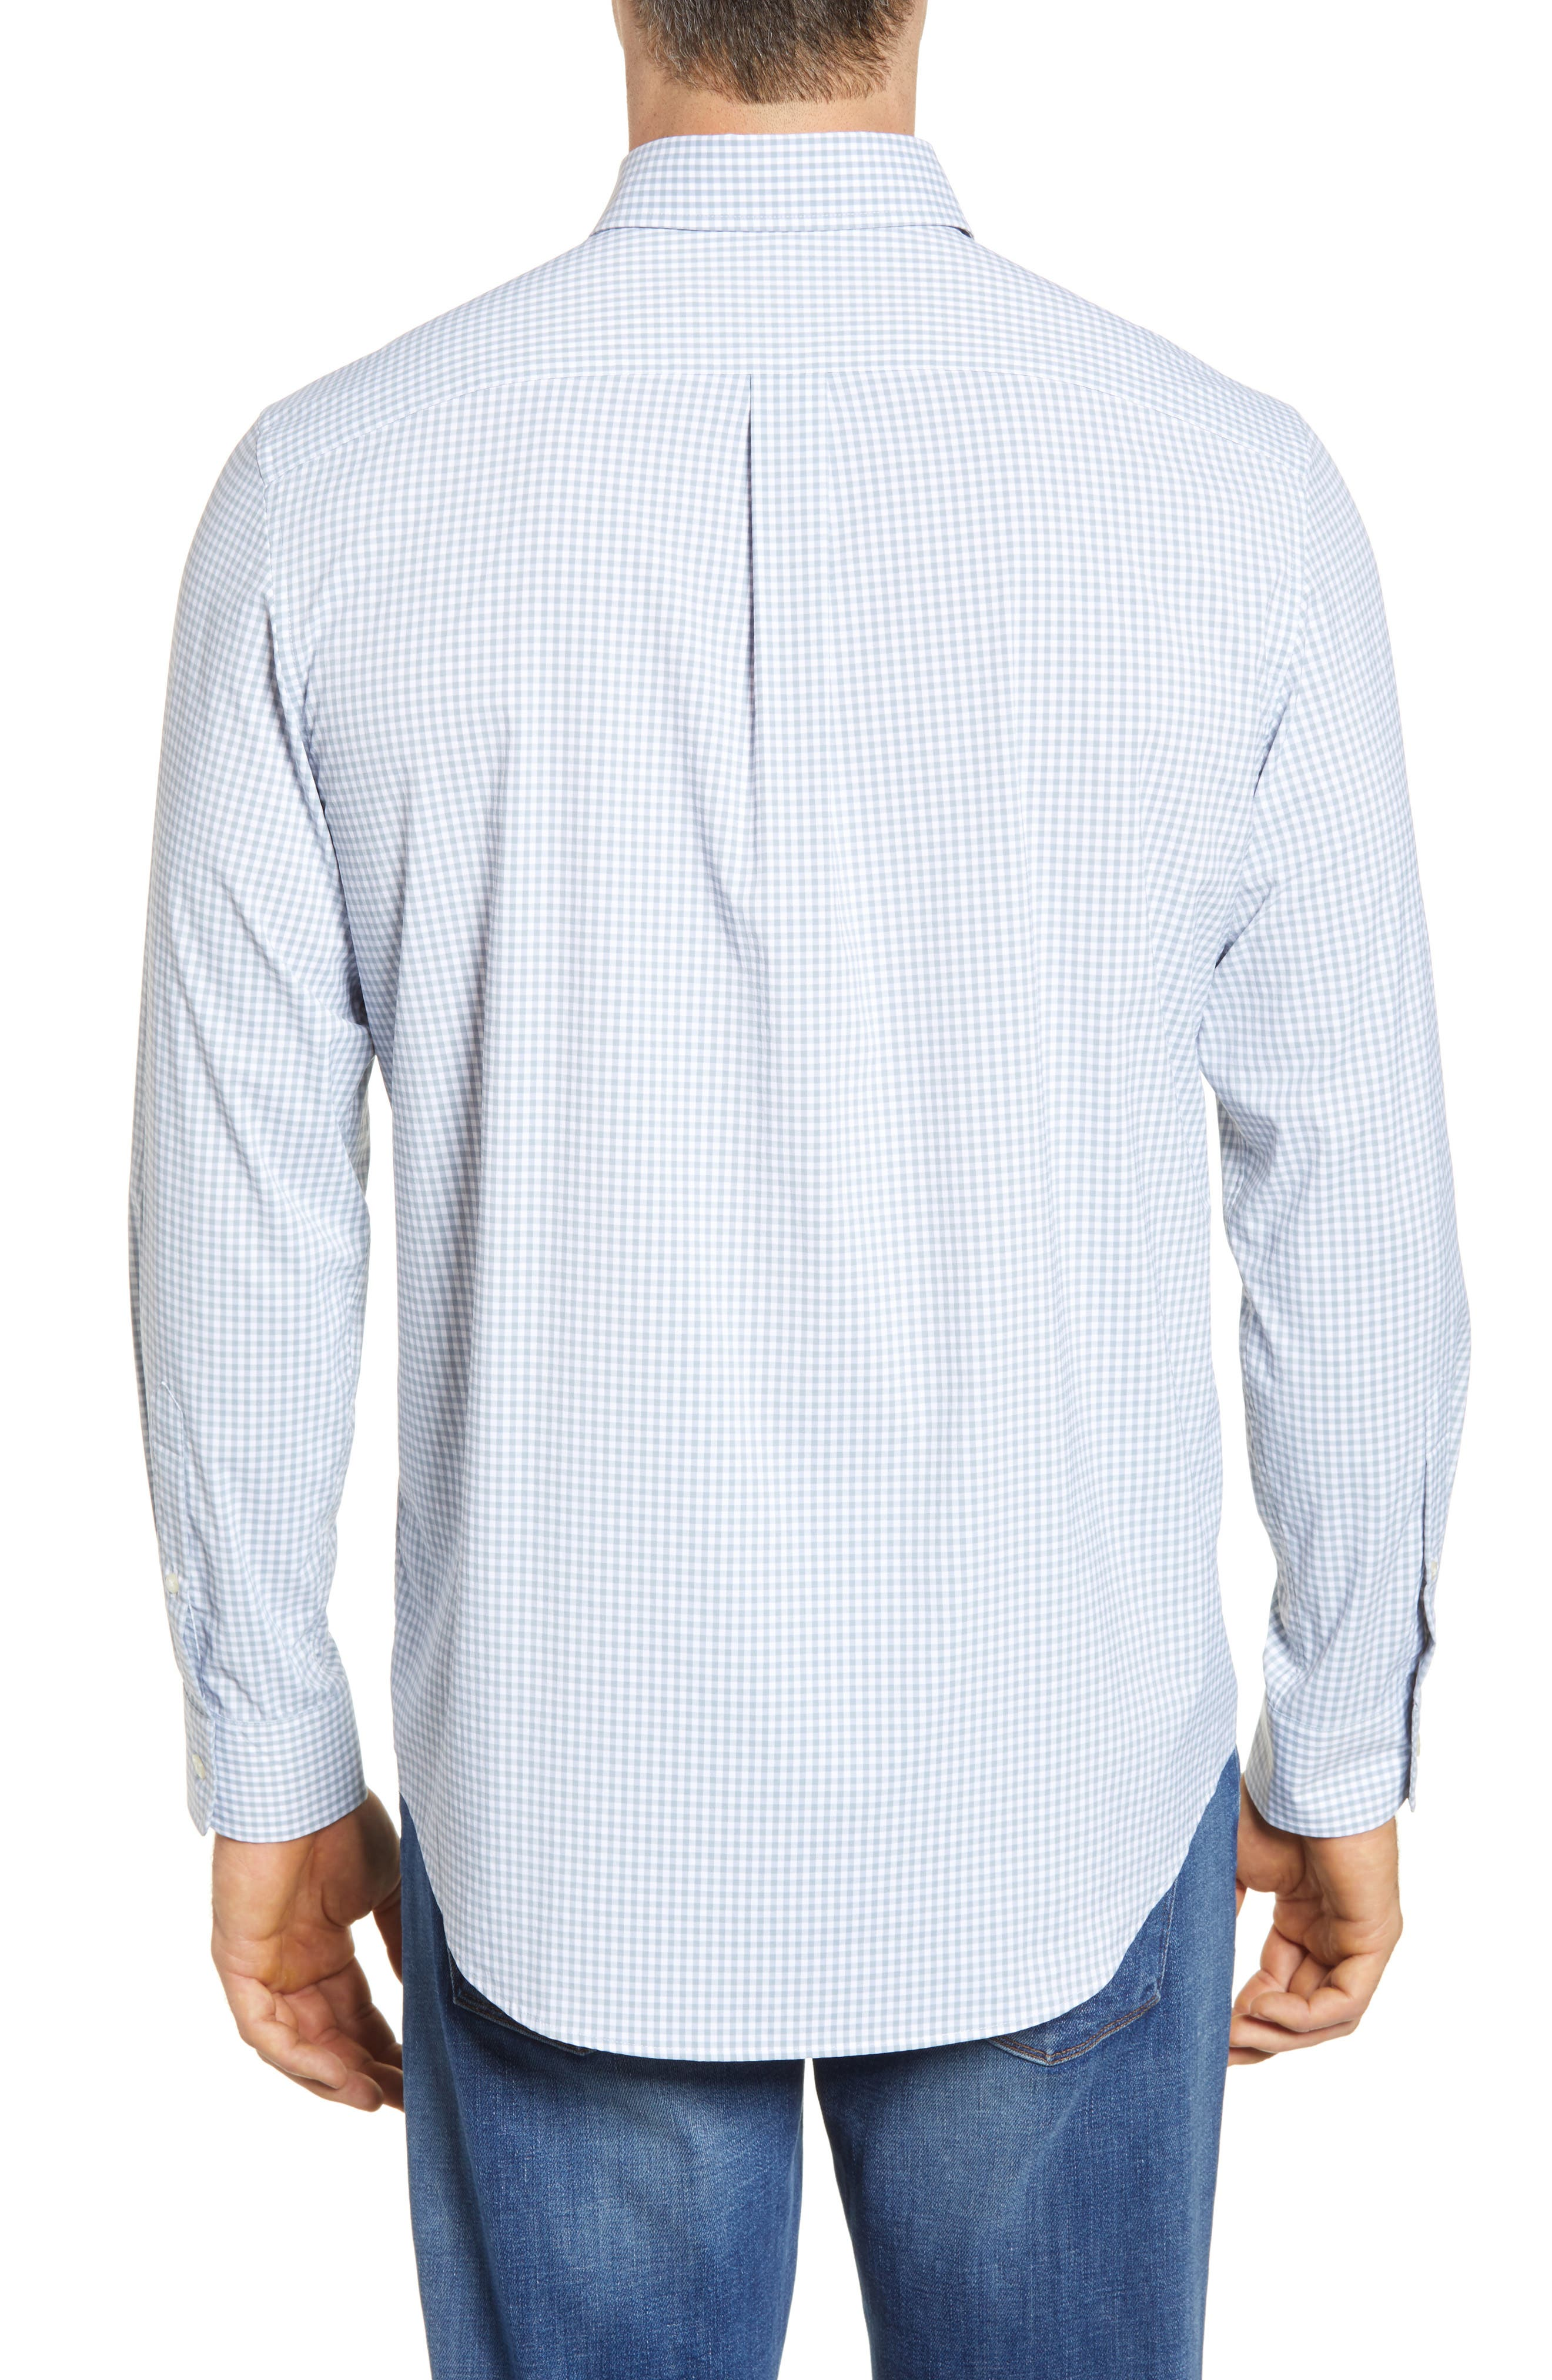 VINEYARD VINES,                             Grand Cay Tucker Regular Fit Gingham Performance Sport Shirt,                             Alternate thumbnail 2, color,                             023